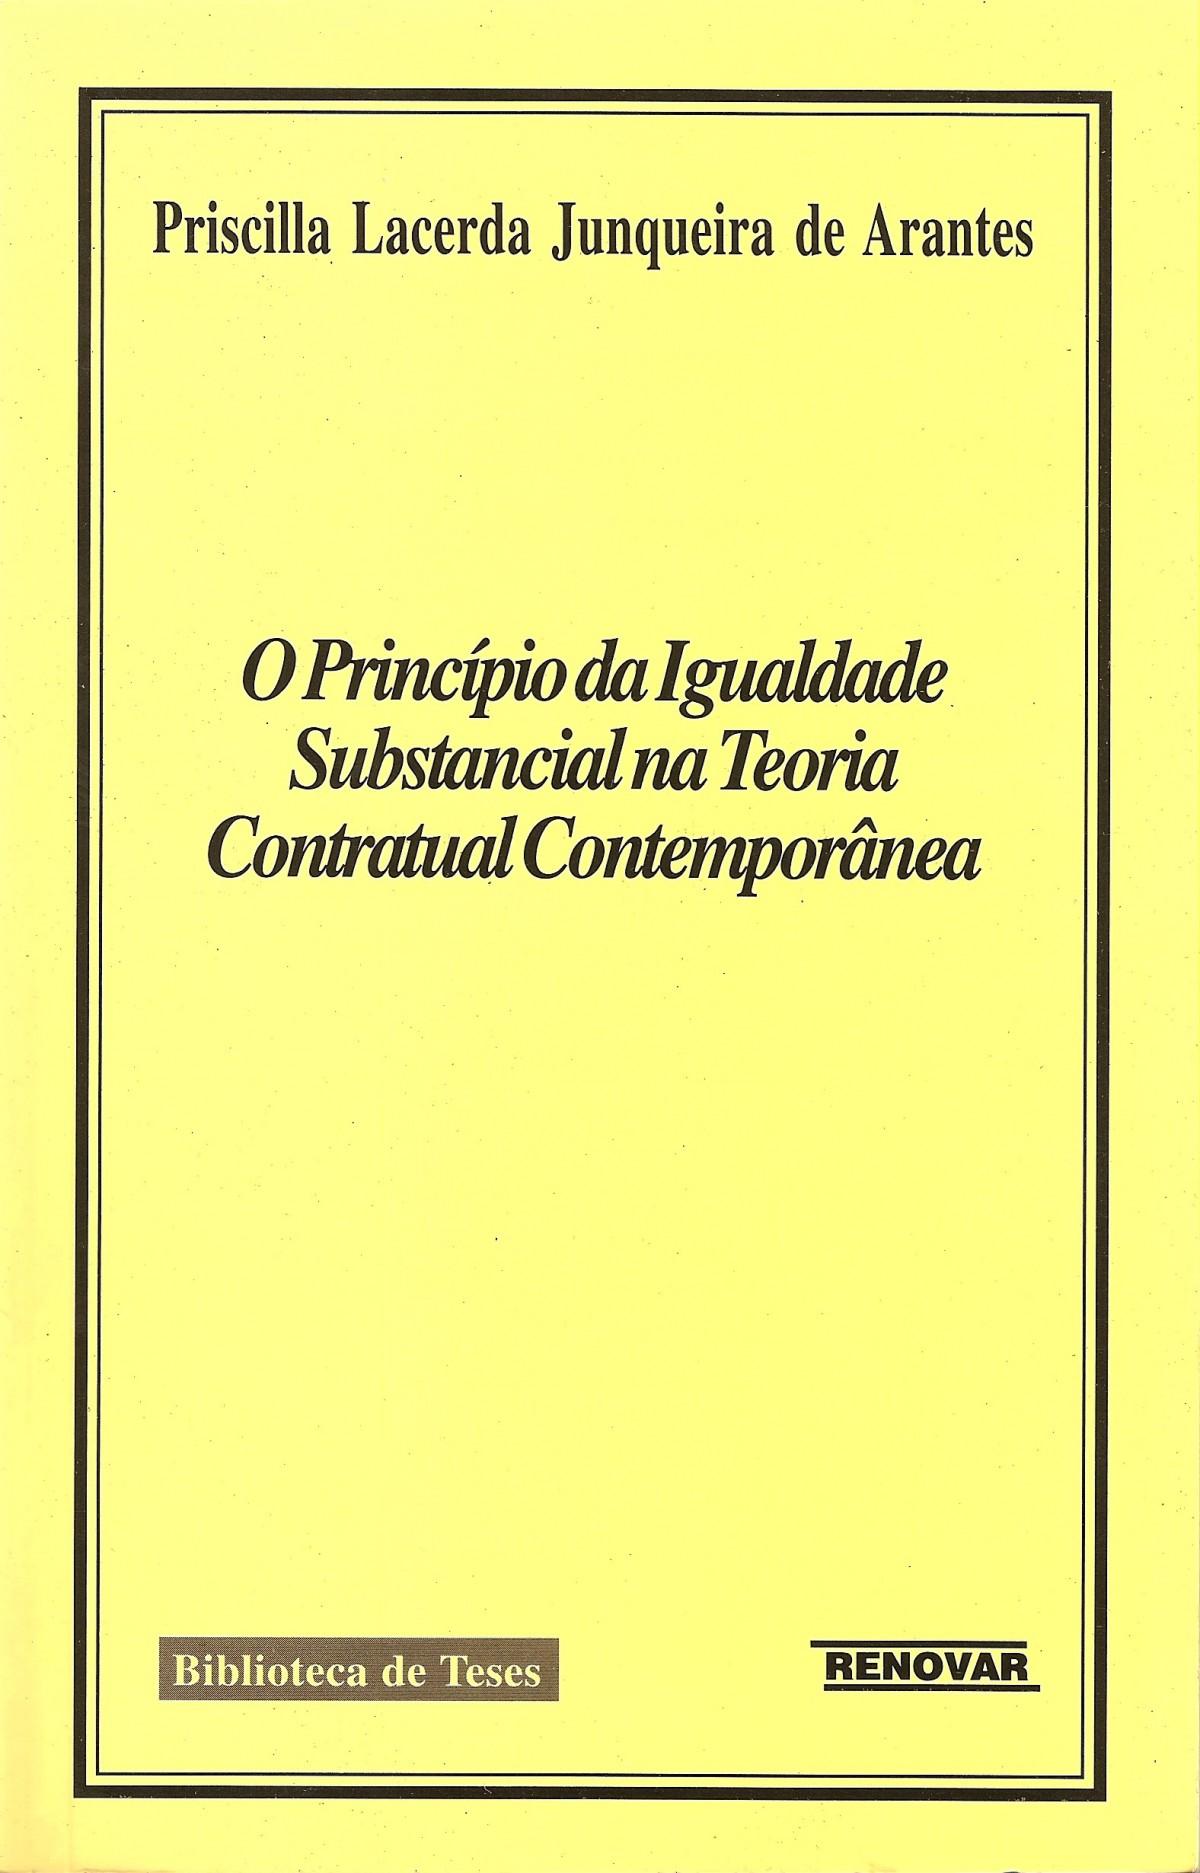 Foto 1 - O Princípio da Igualdade Substancial na Teoria Contratual Contemporânea